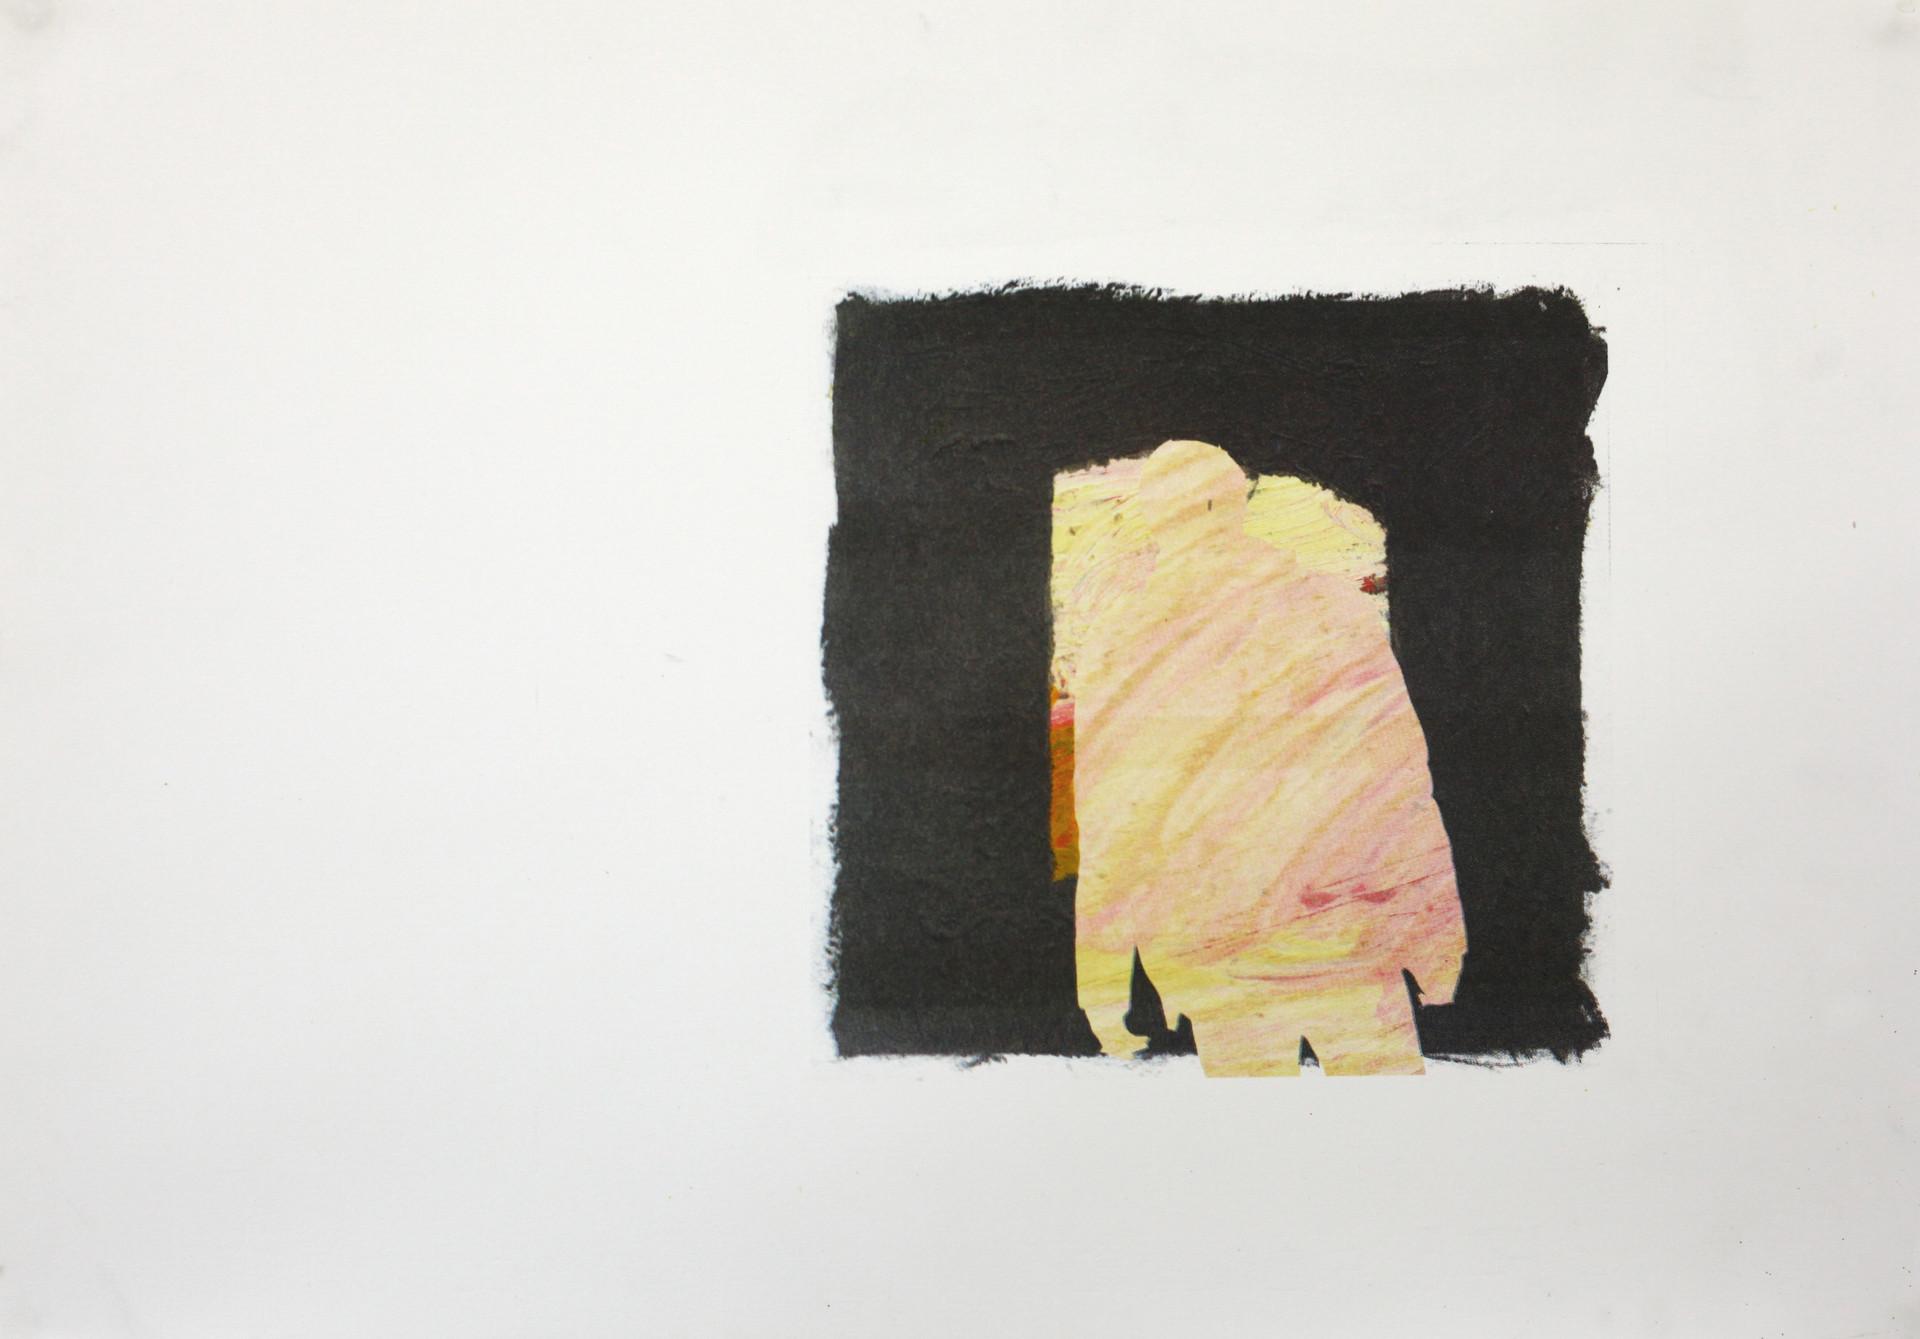 Noeth, lithoprint, 42 x 29 cm, 2016